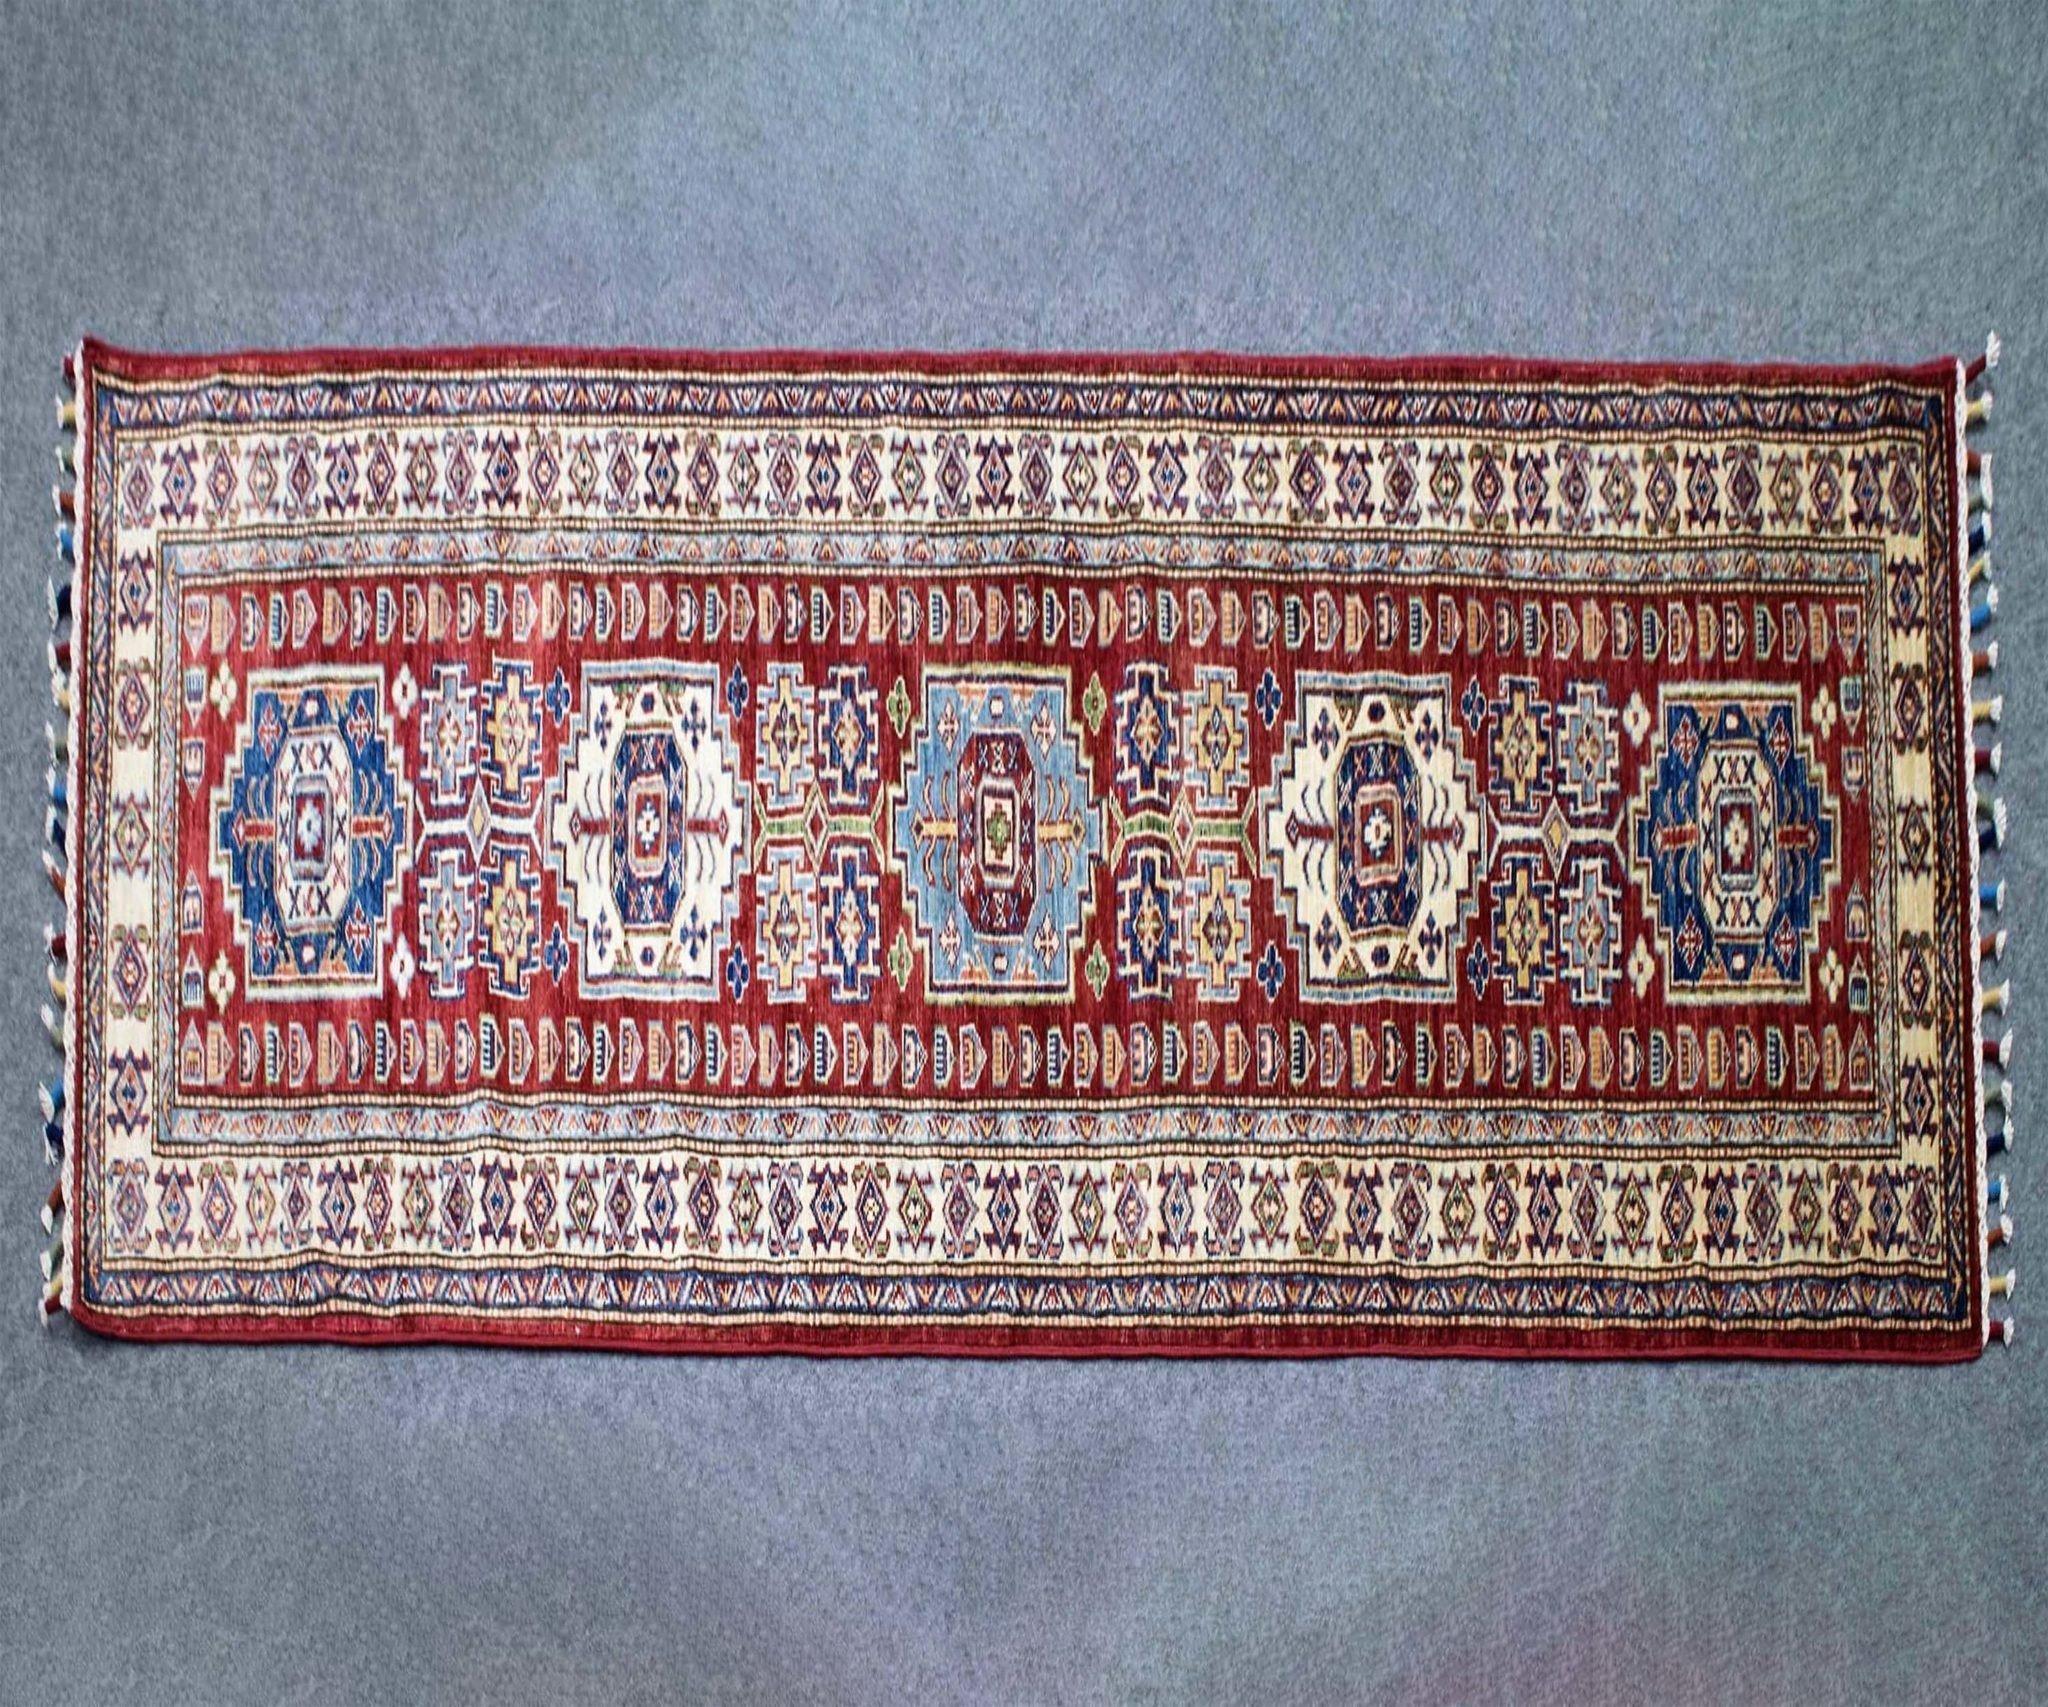 Red Rugs for Bedroom Inspirational 3x10 Elegant Traditional Super Kazak Sk 111